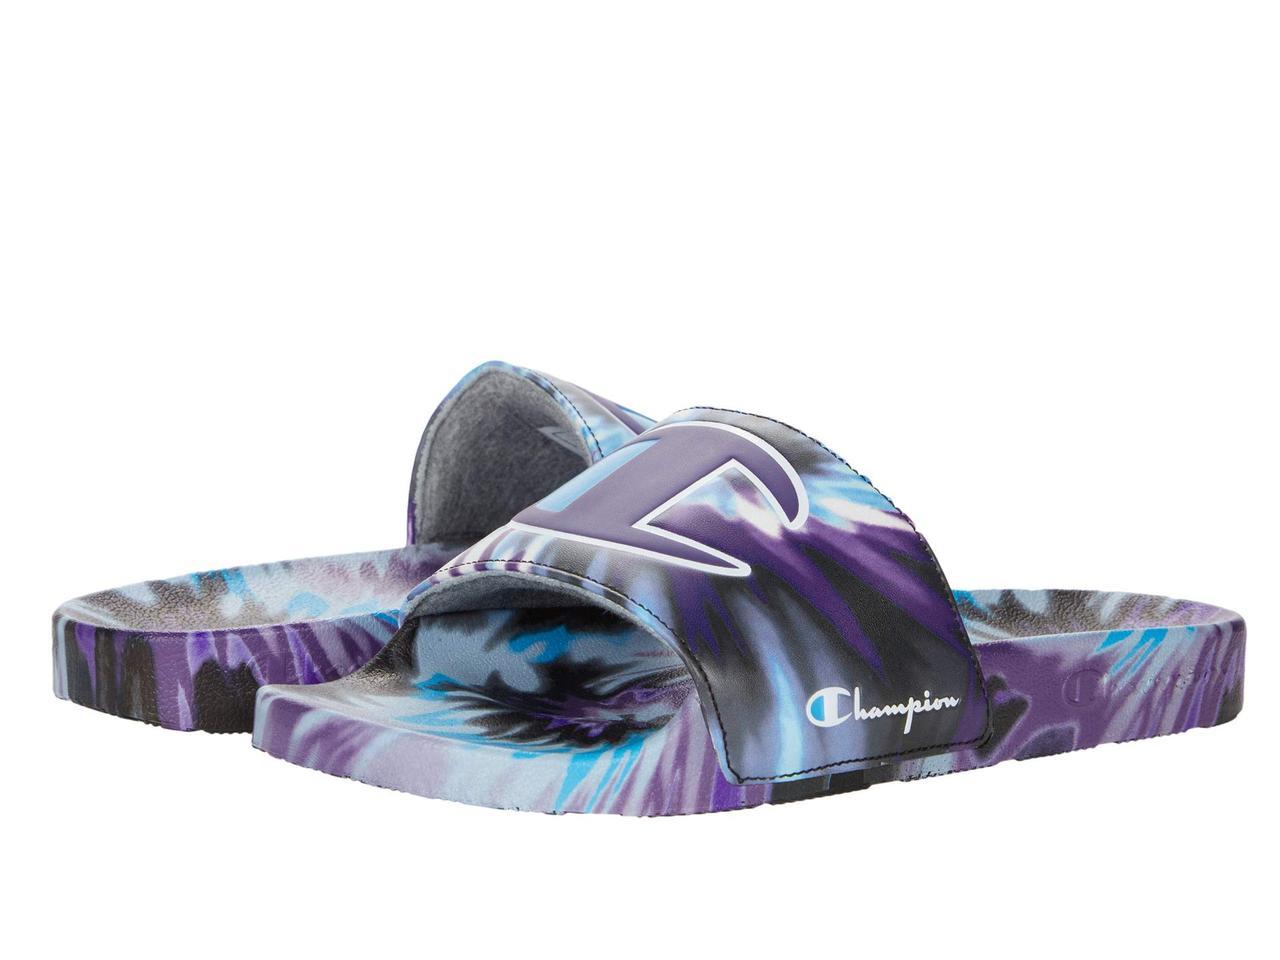 Сандали/Вьетнамки (Оригинал) Champion Ipo Tie-Dye Black/Purple/Teal